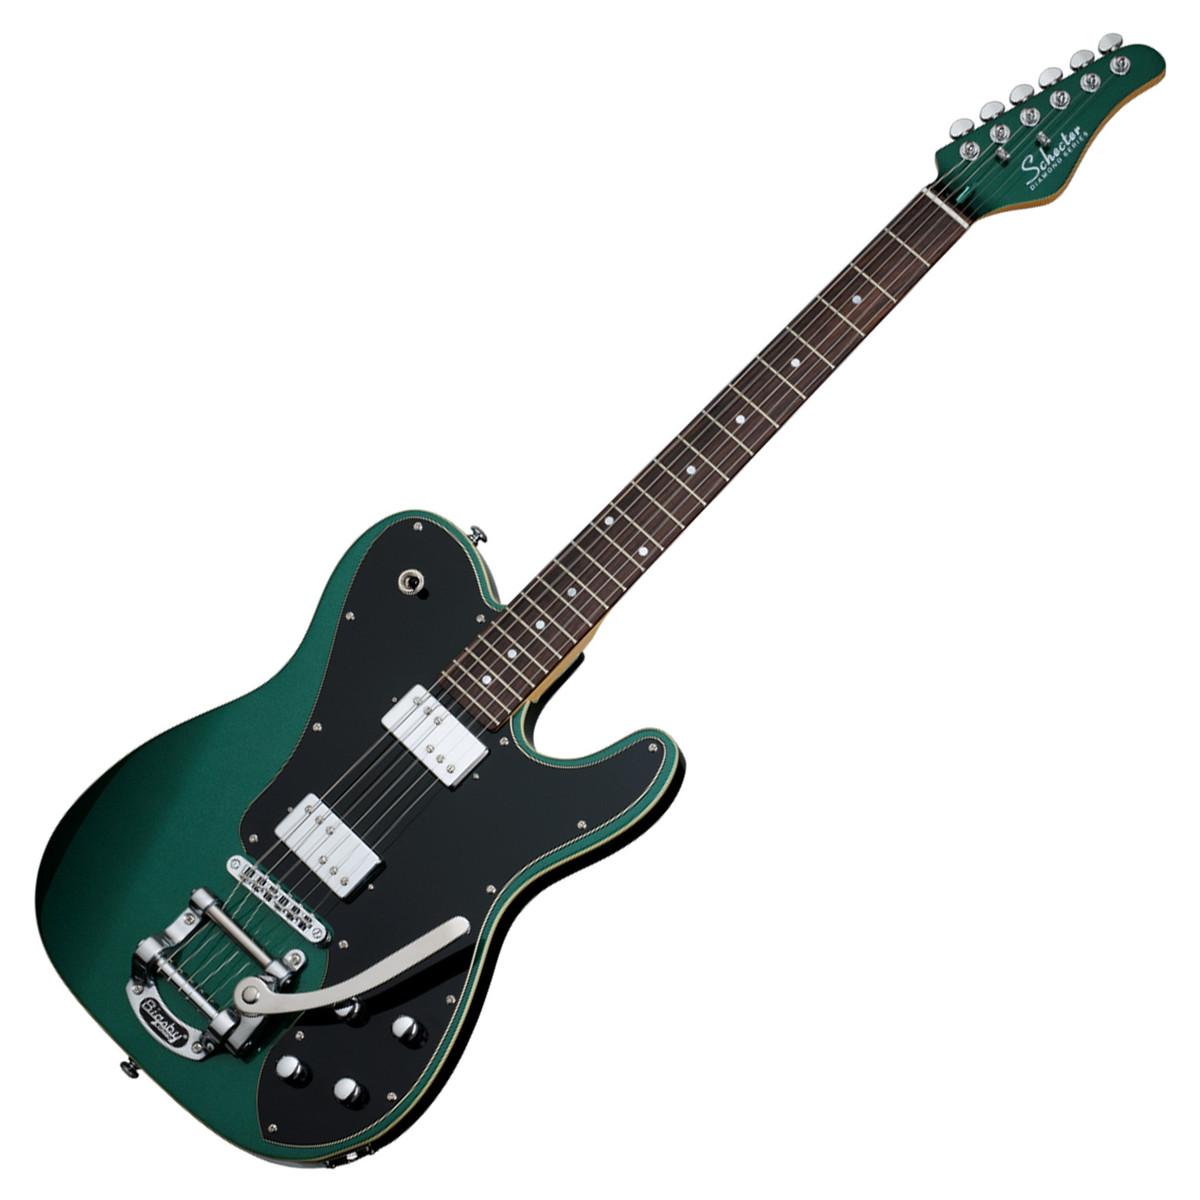 schecter pt fastback ii b electric guitar dark emerald green at. Black Bedroom Furniture Sets. Home Design Ideas